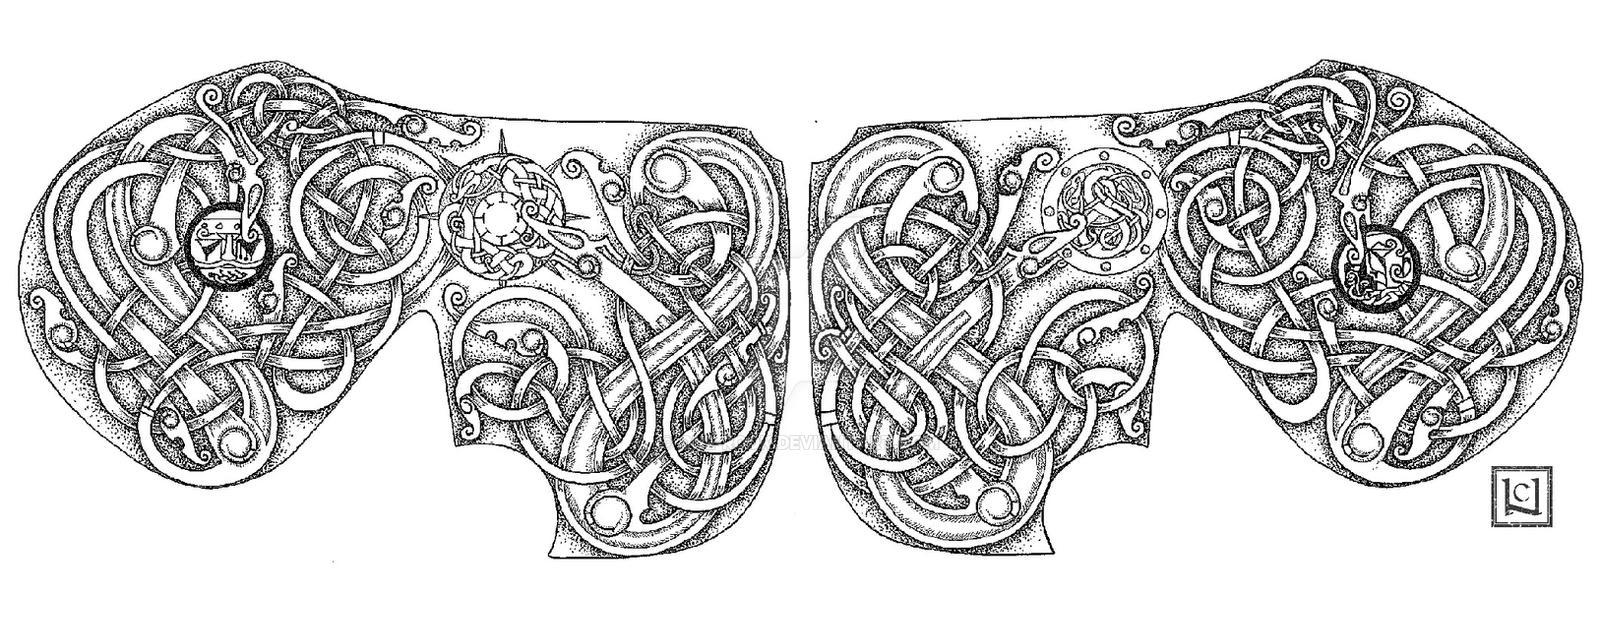 Traditional Scandinavian Tattoos